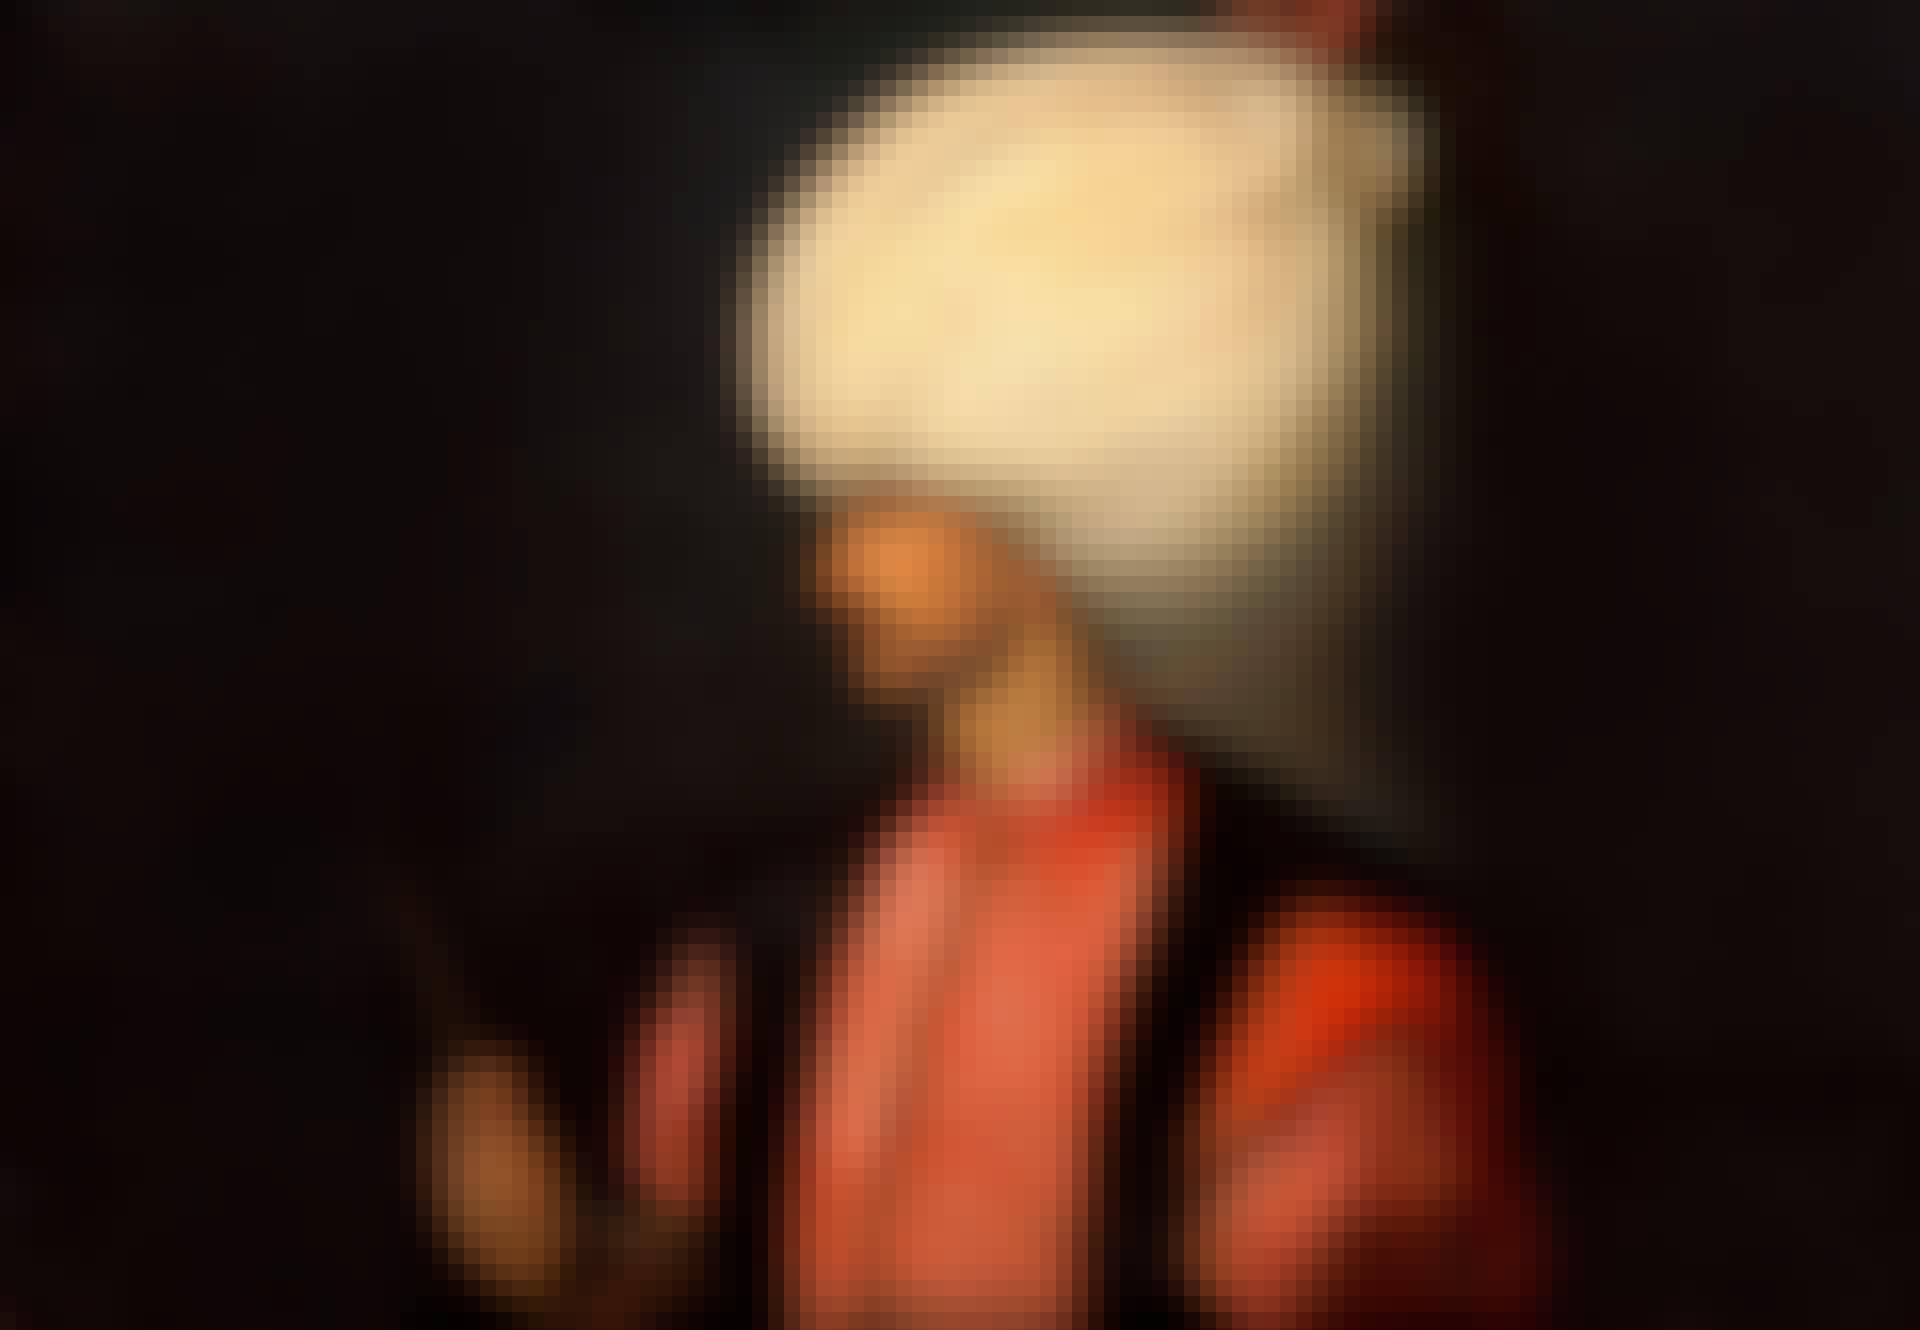 sultan süleyman i